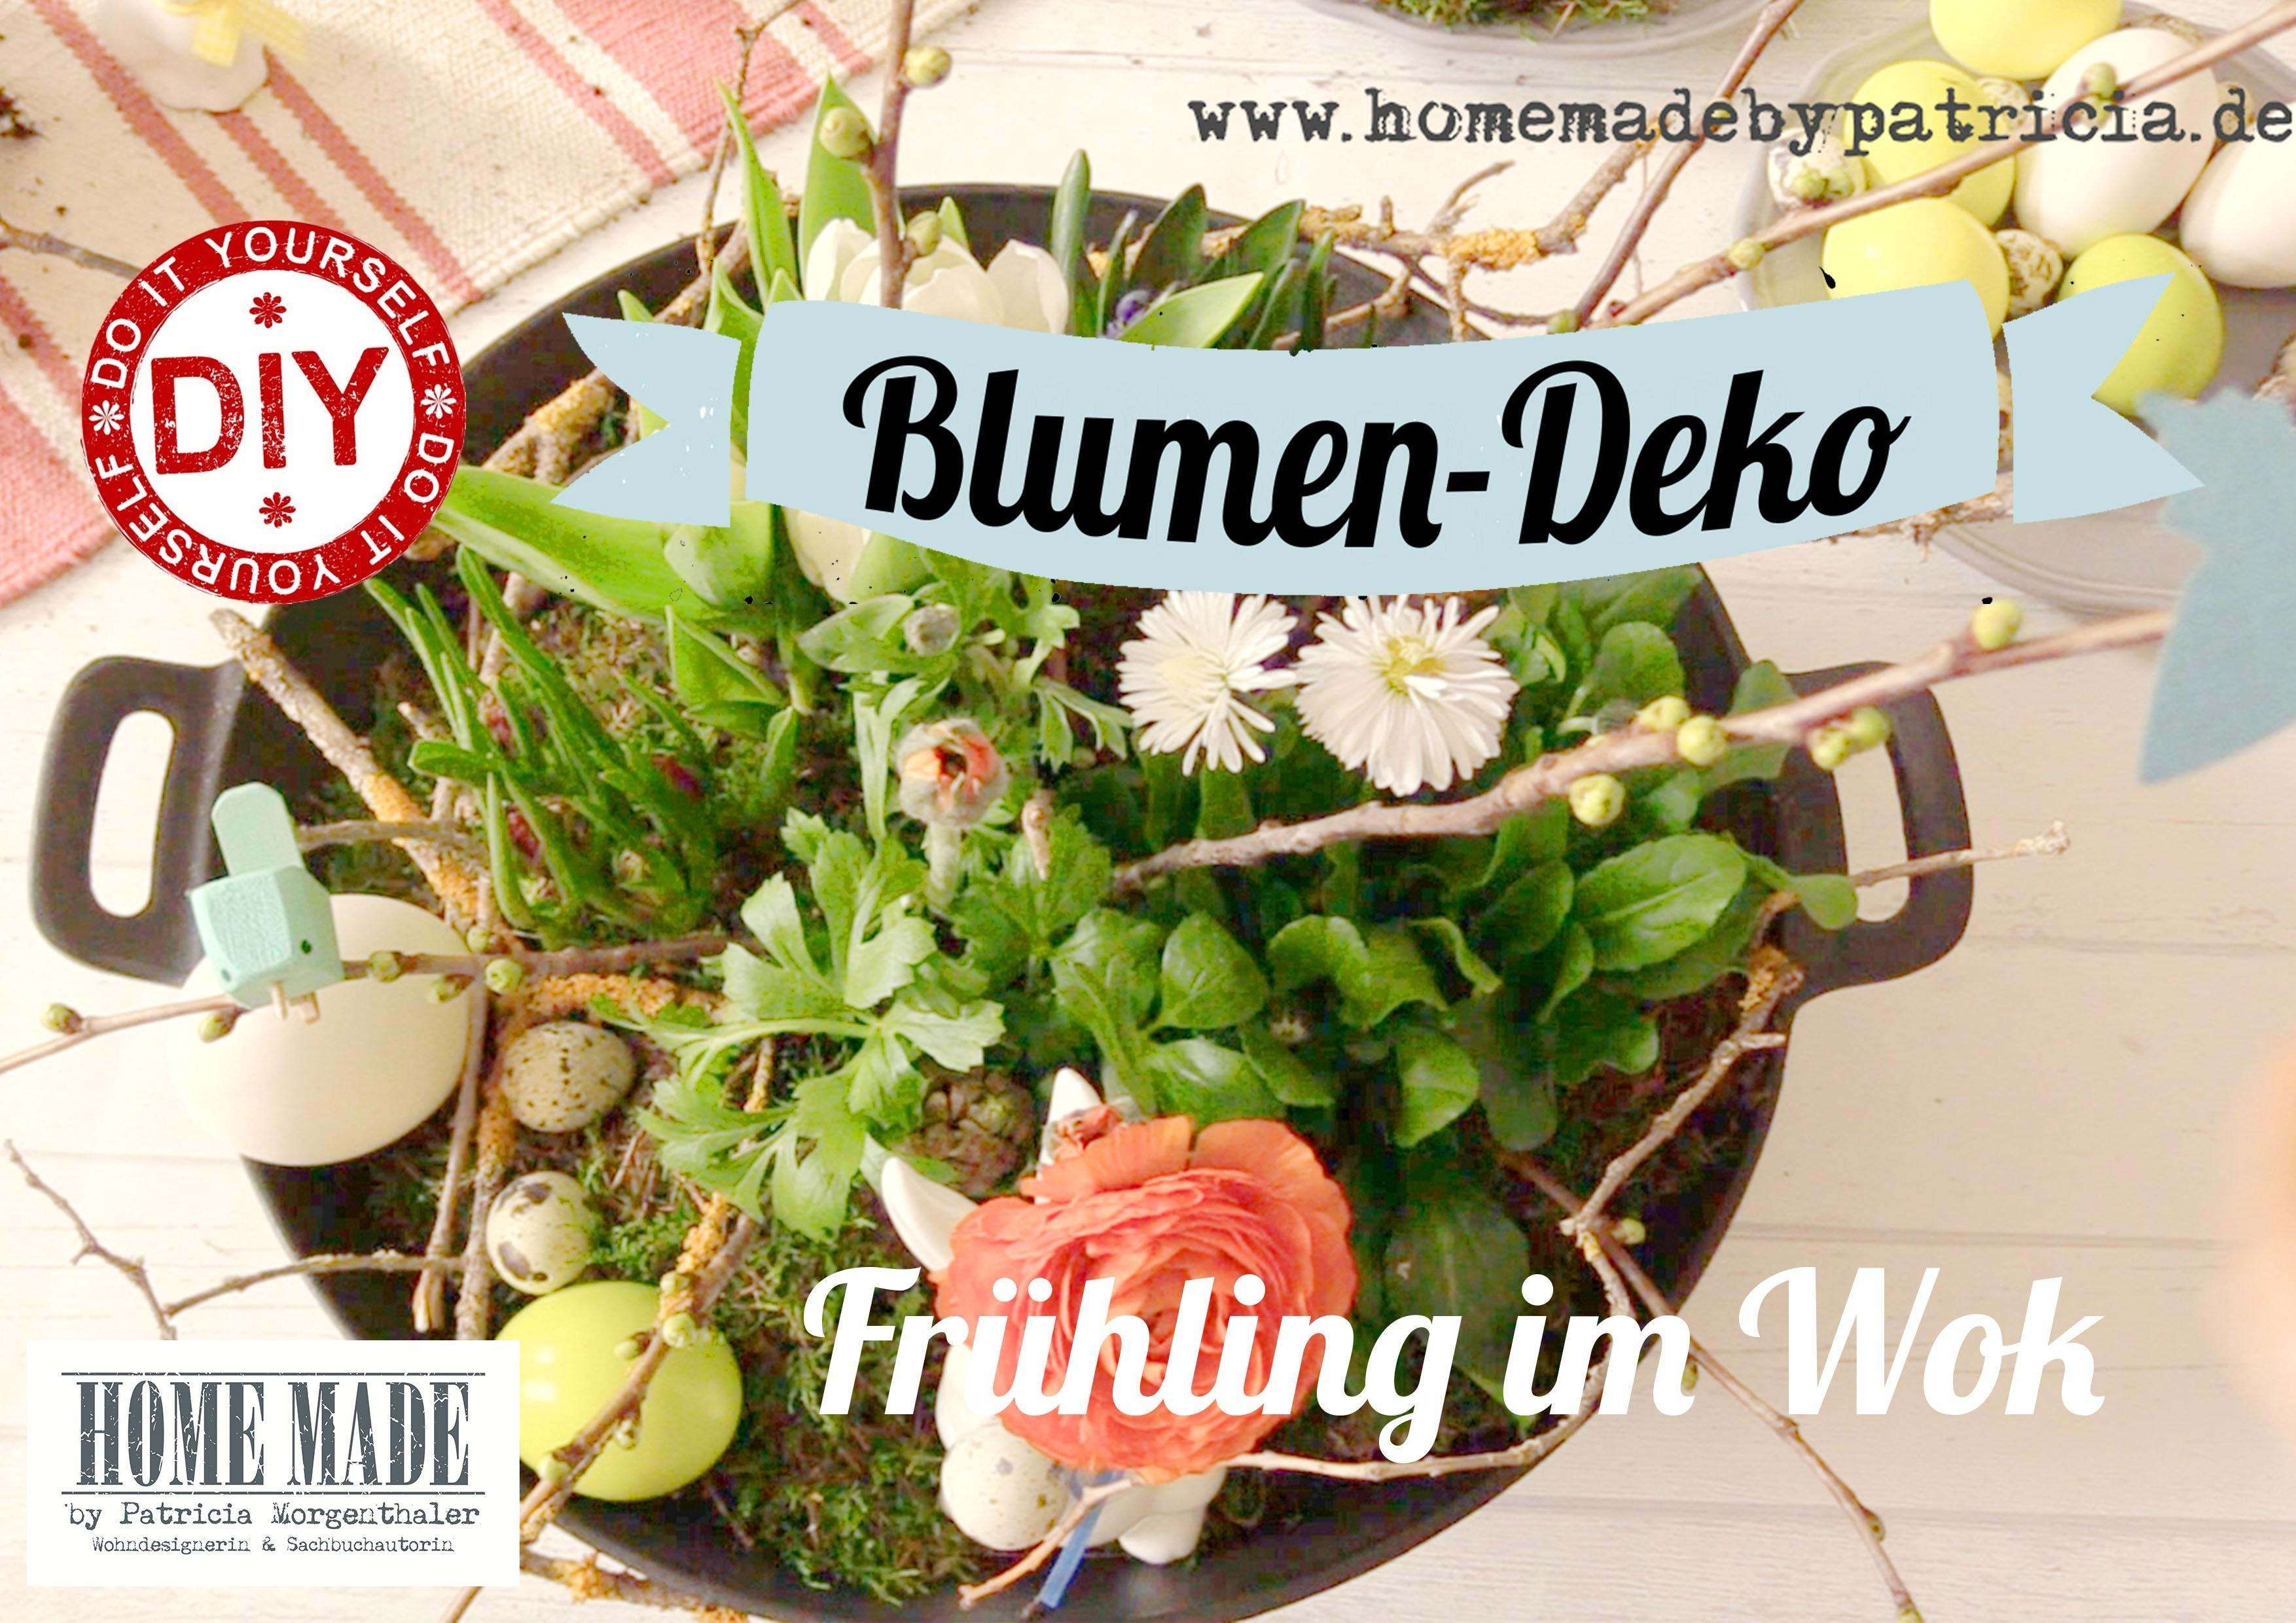 How To I Frühling im Wok I Ostern I Blumendeko I Deko Inspirationen - Homemade by Patricia